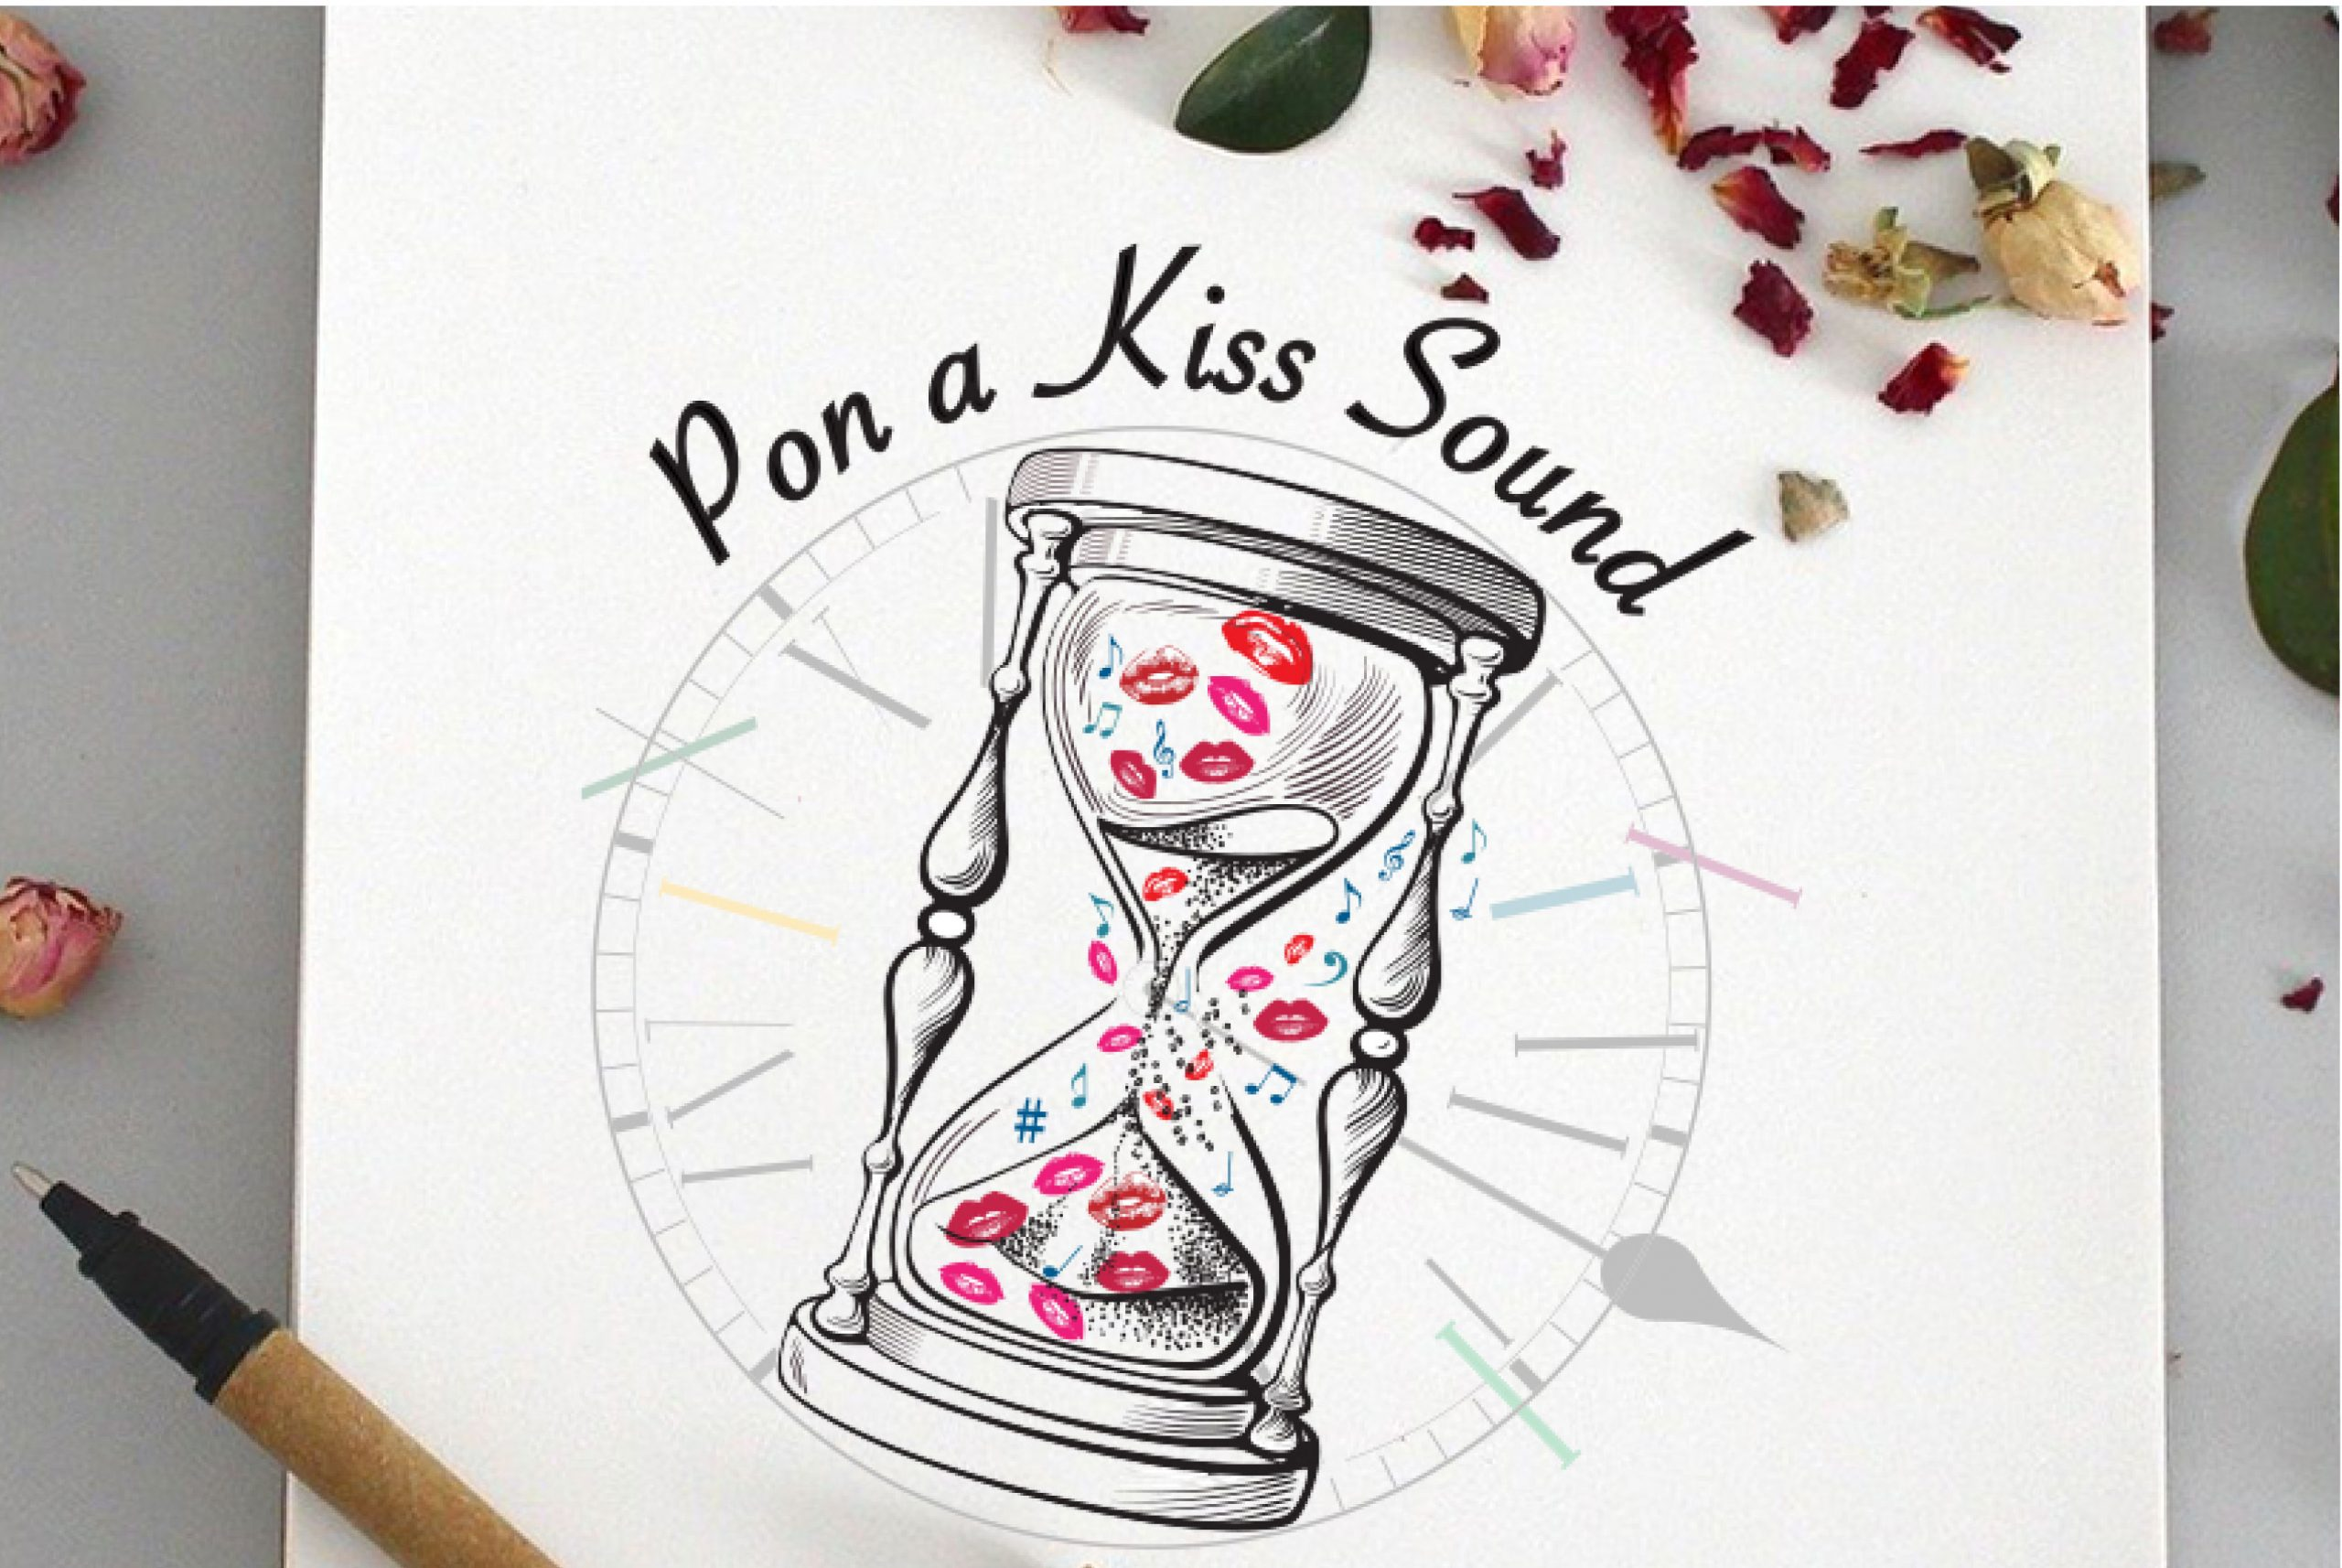 création du logo Pon a Kiss sound